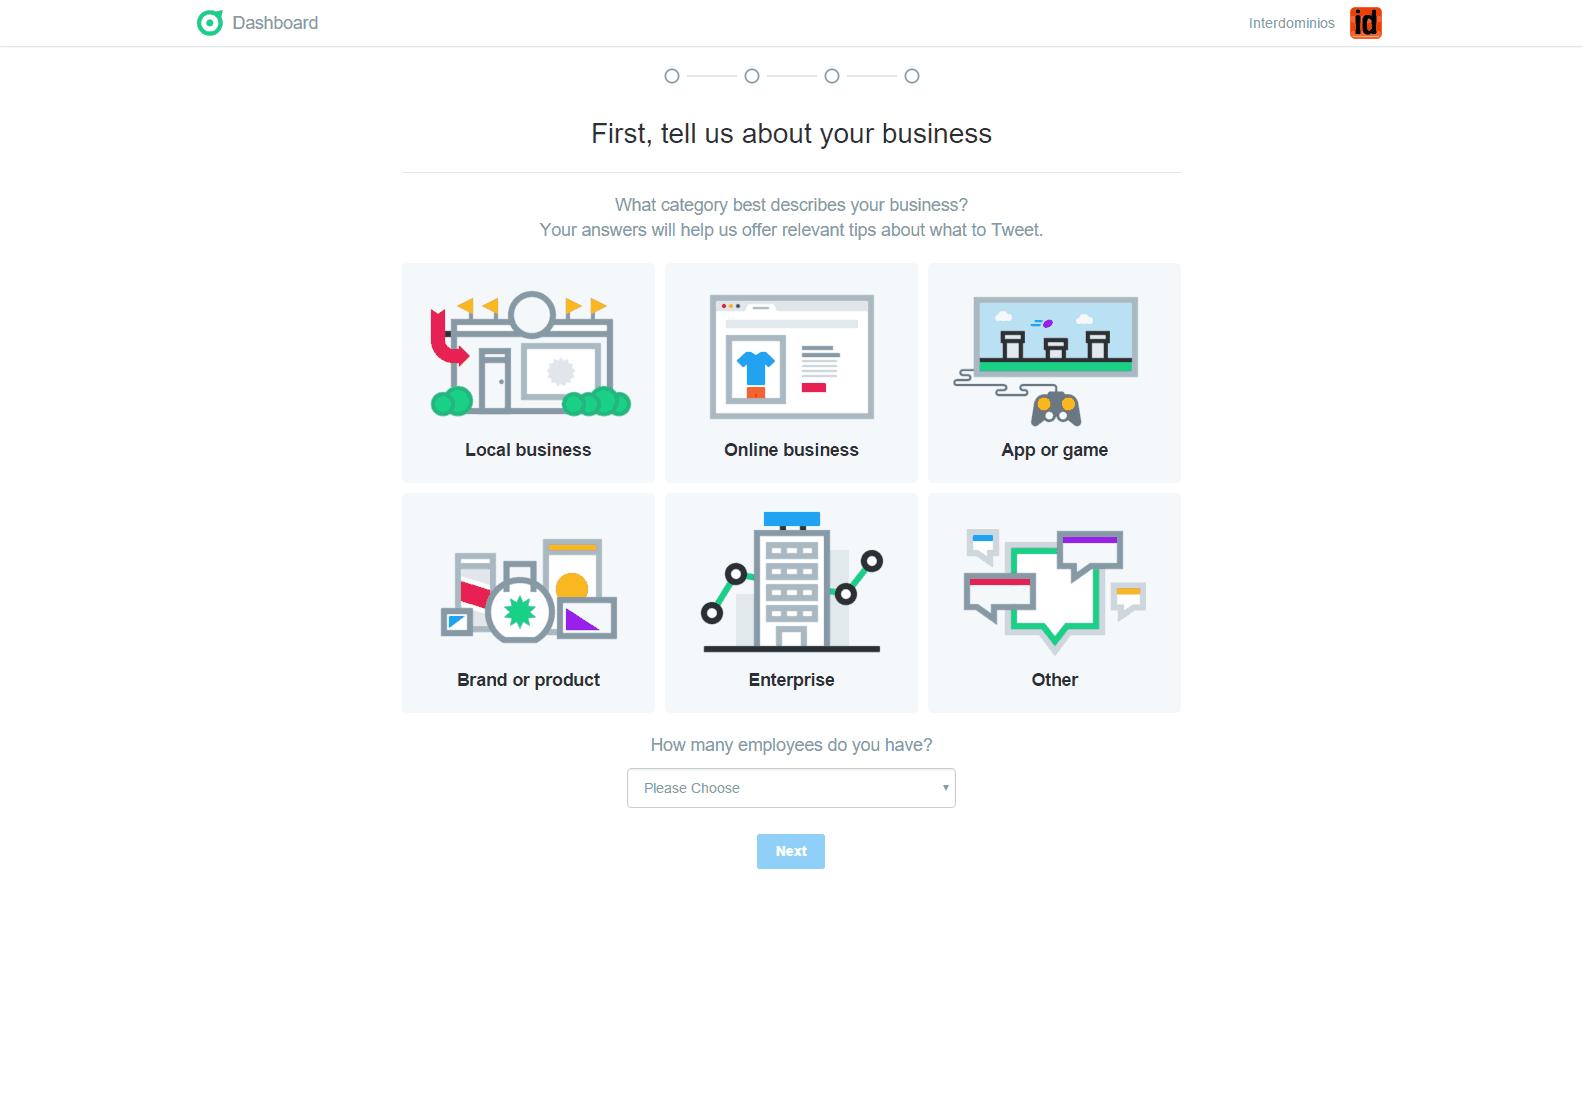 FireShot Capture 3 - Twitter Dashboard - https___dashboard.twitter.com_i_onboard